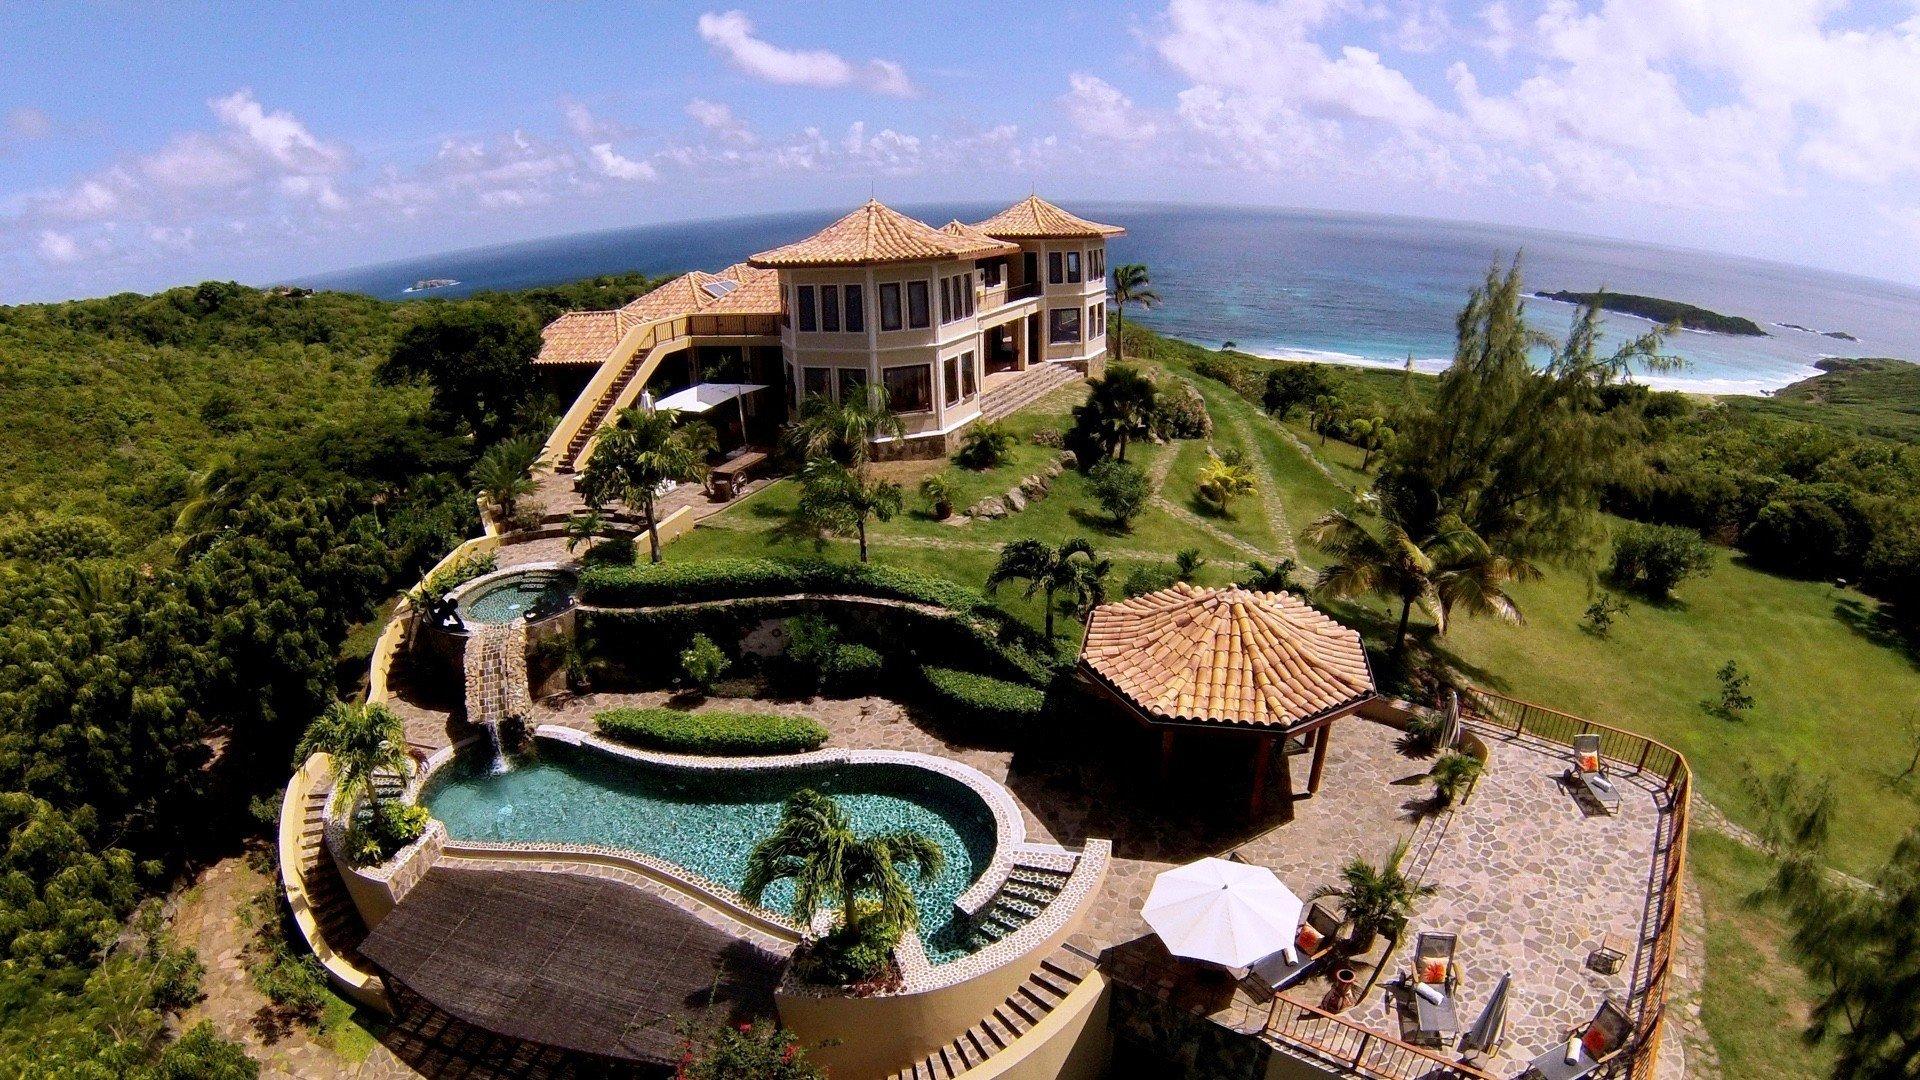 Paradiso Villa Paradiso Mustique Isle Blue